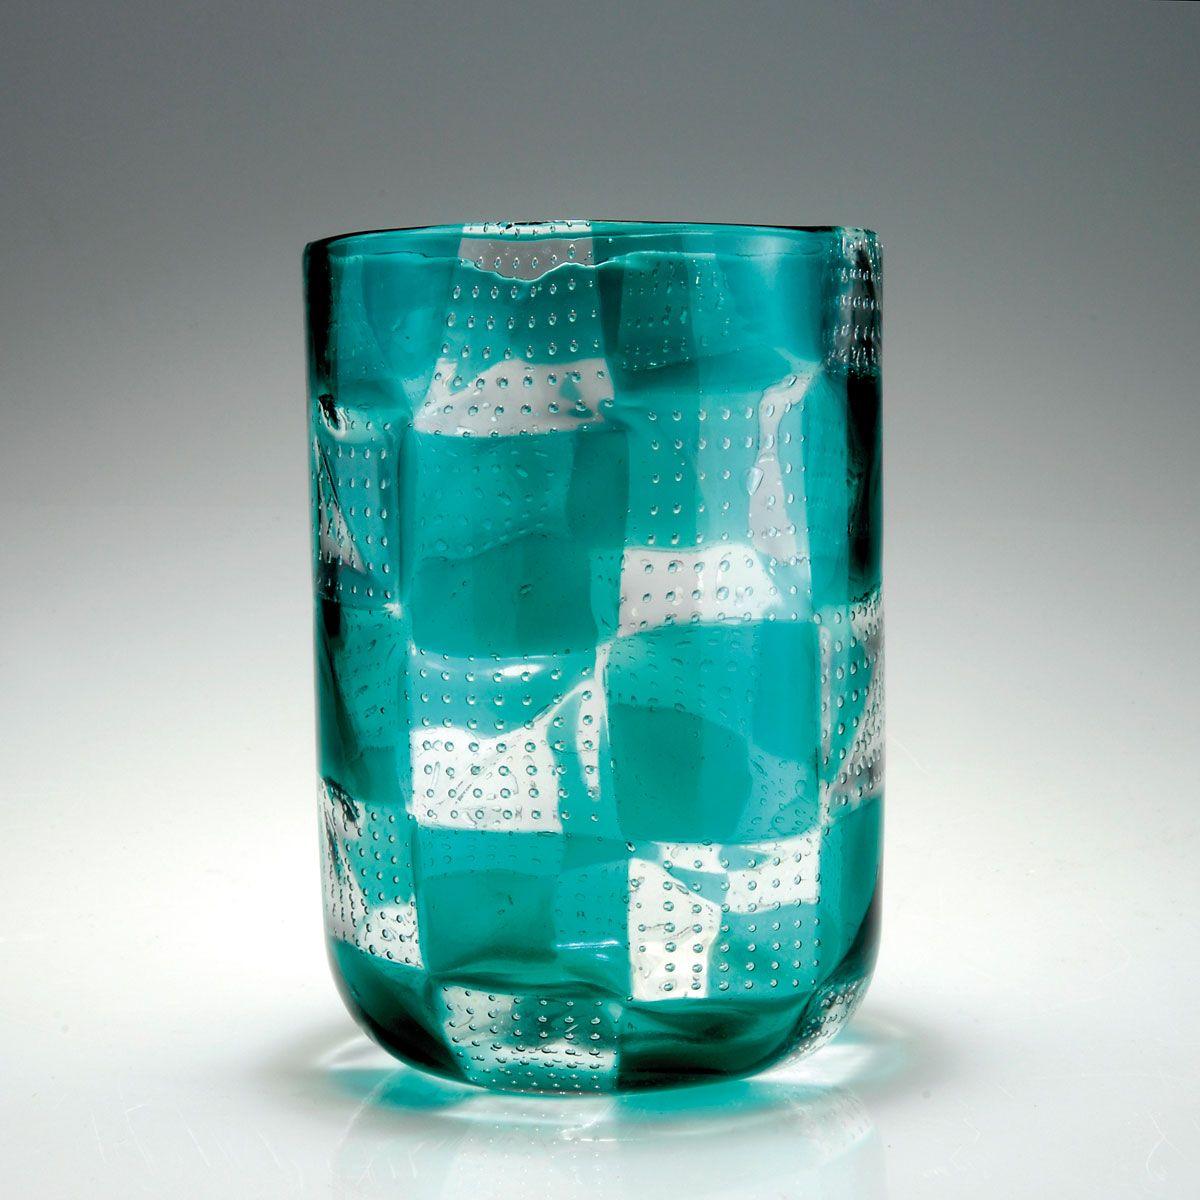 Ercole Barovier. 'Intarsio' vase. H. 20.5 cm. Designed in 1961-63. Made by Barovier & Toso.